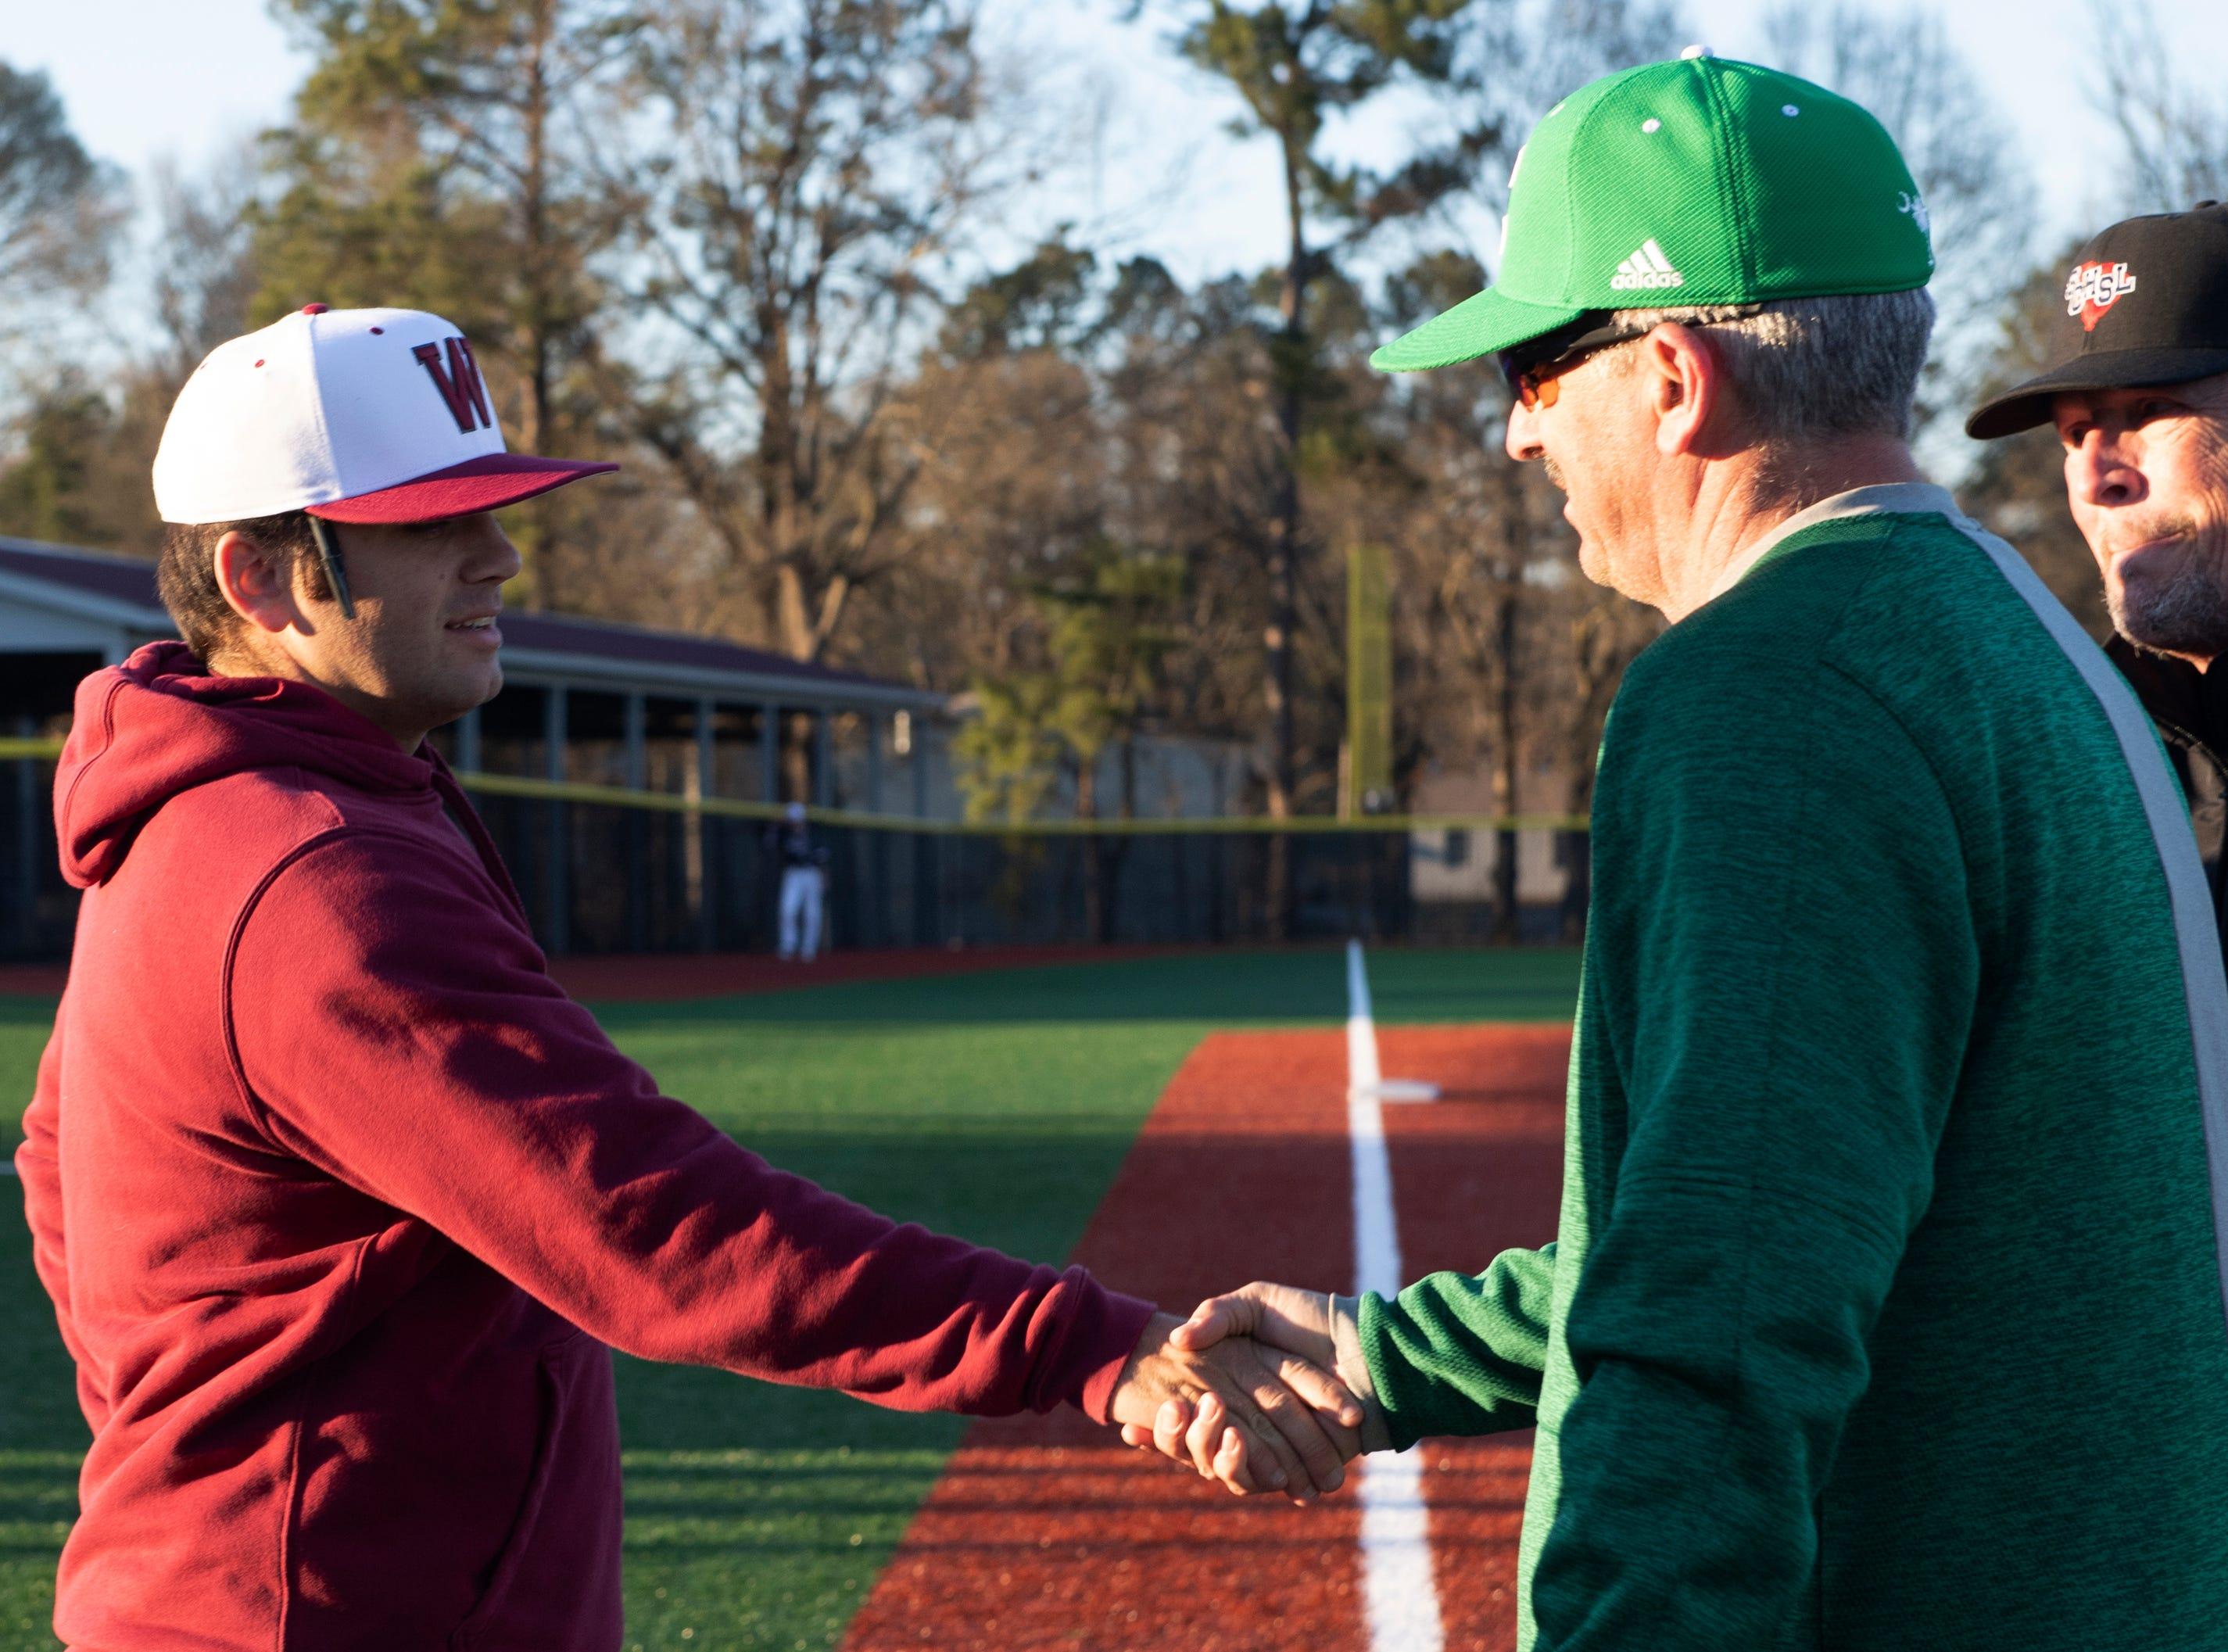 Westside High School head coach Jarrod Payne (left) and his father Easley High School head coach Gill Payne shake hands before the start of their game at Westside High School Tuesday, Mar. 5, 2019.